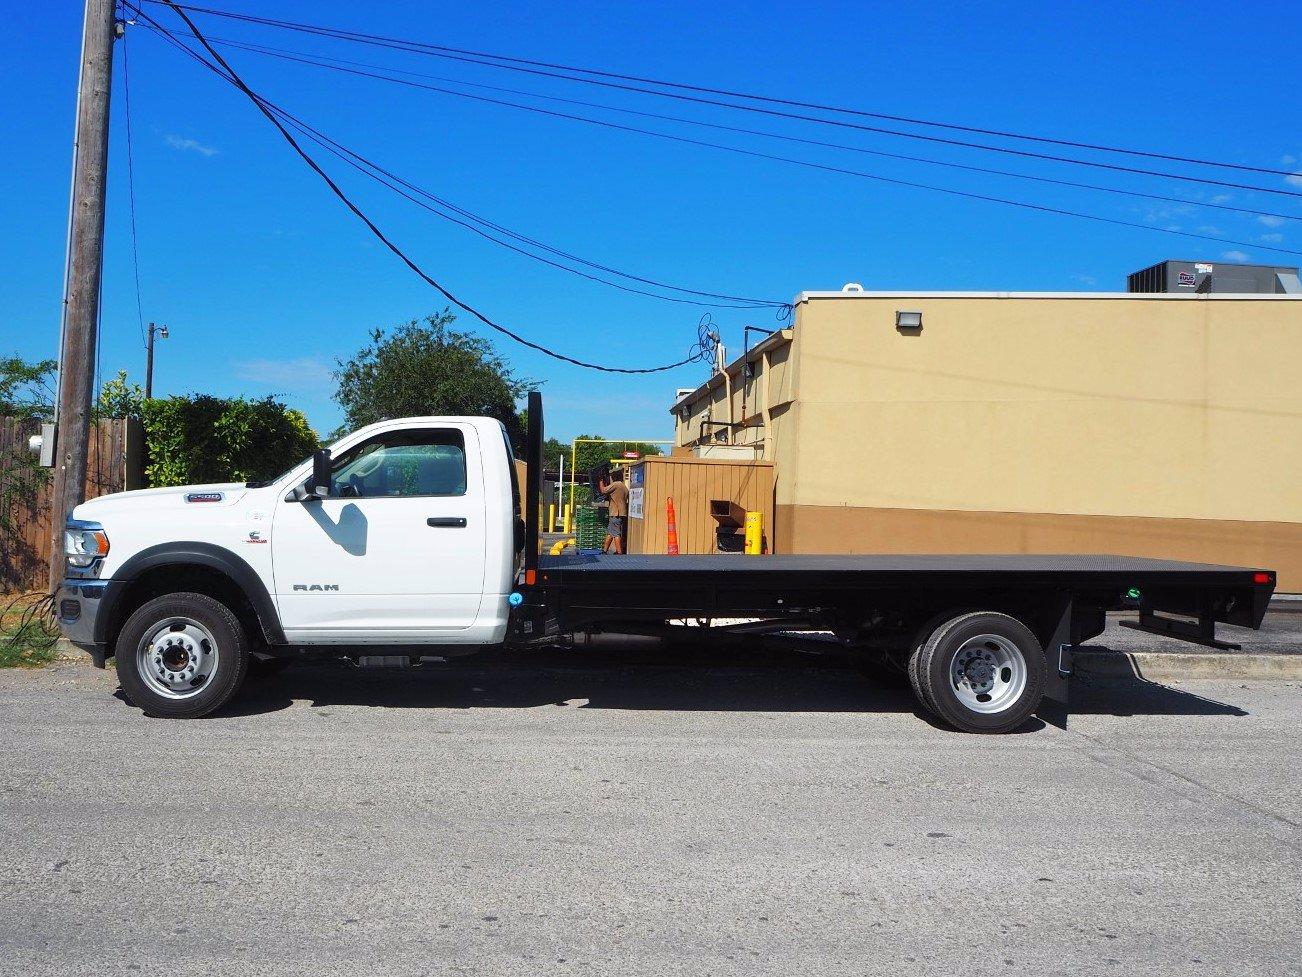 2019 Ram 5500 Regular Cab DRW 4x2, Axton Truck Equipment Flatbed #TG717489 - photo 13